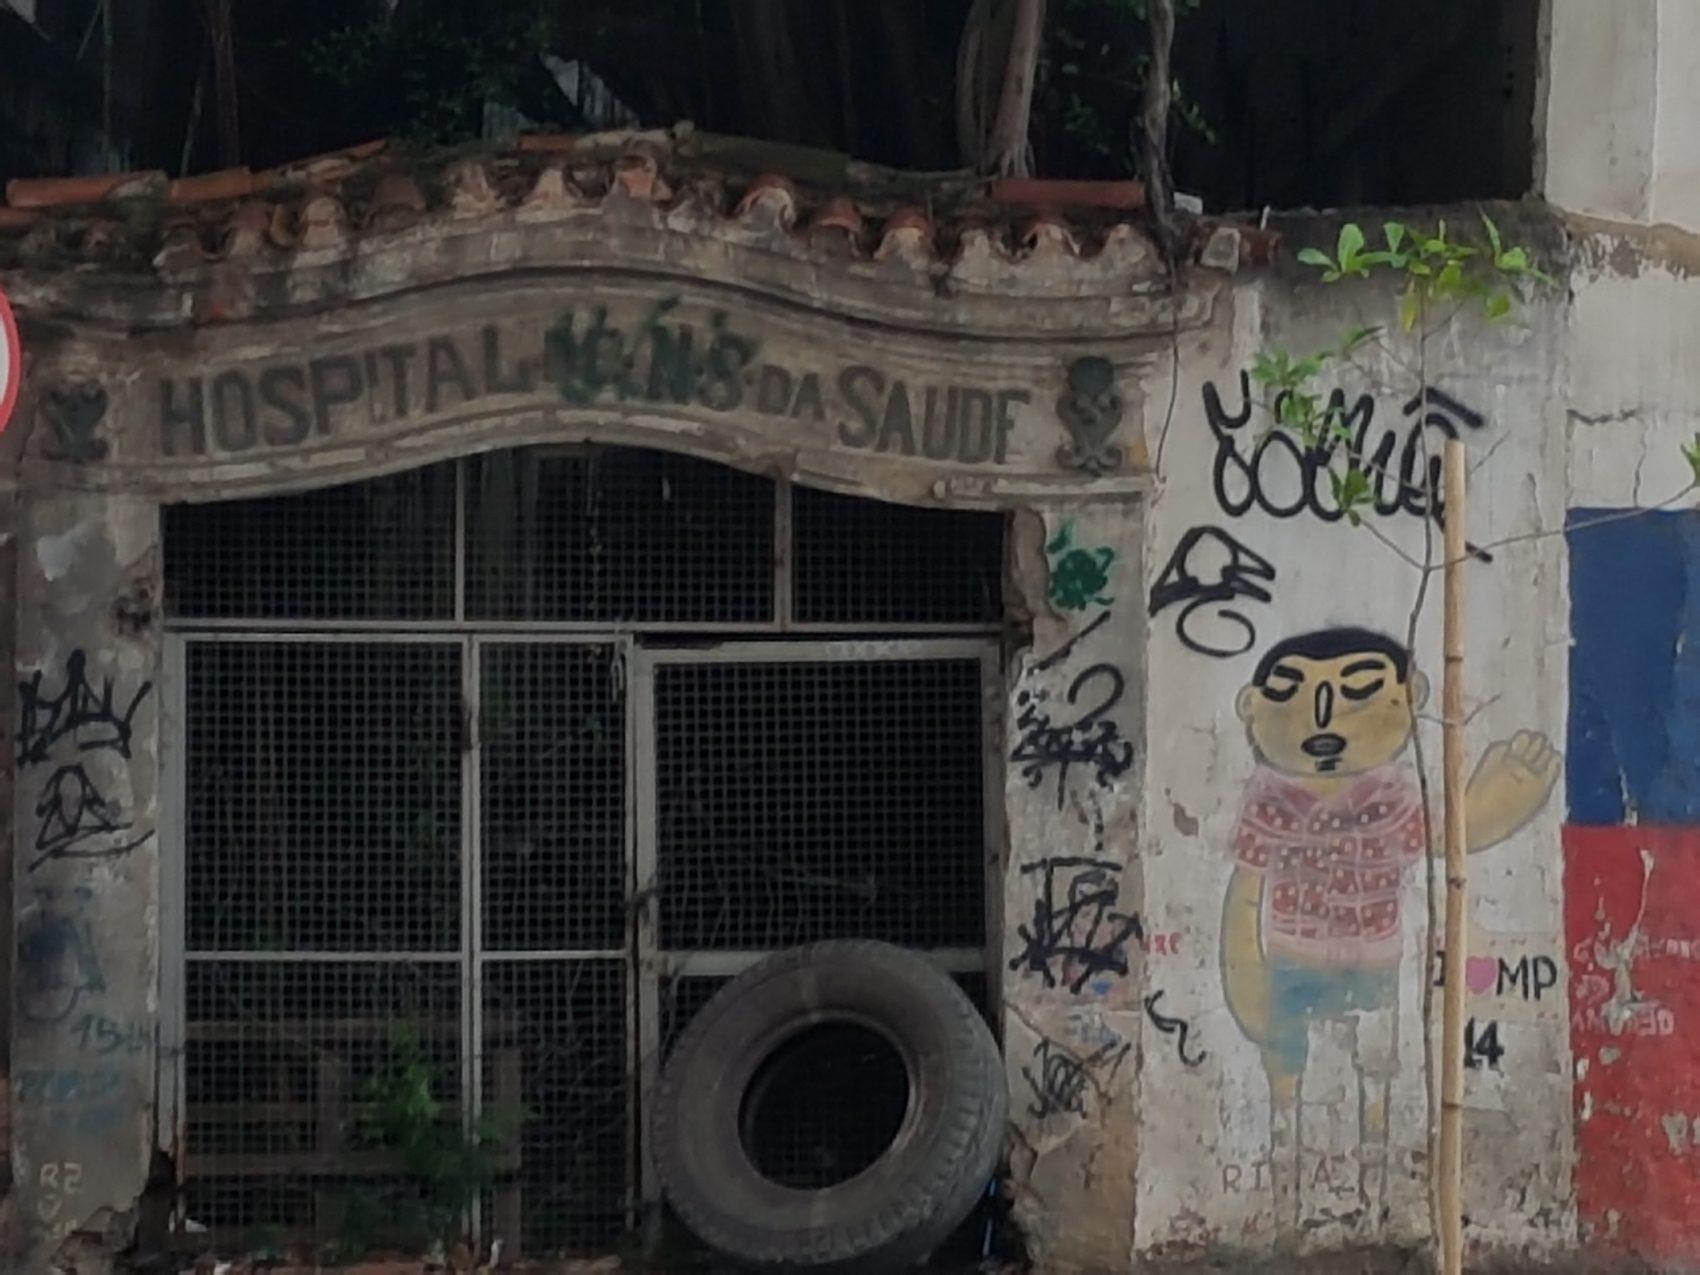 Hospital dos Ingleses, sobras do mtempo de Machado (Foto Oscar Valporto)